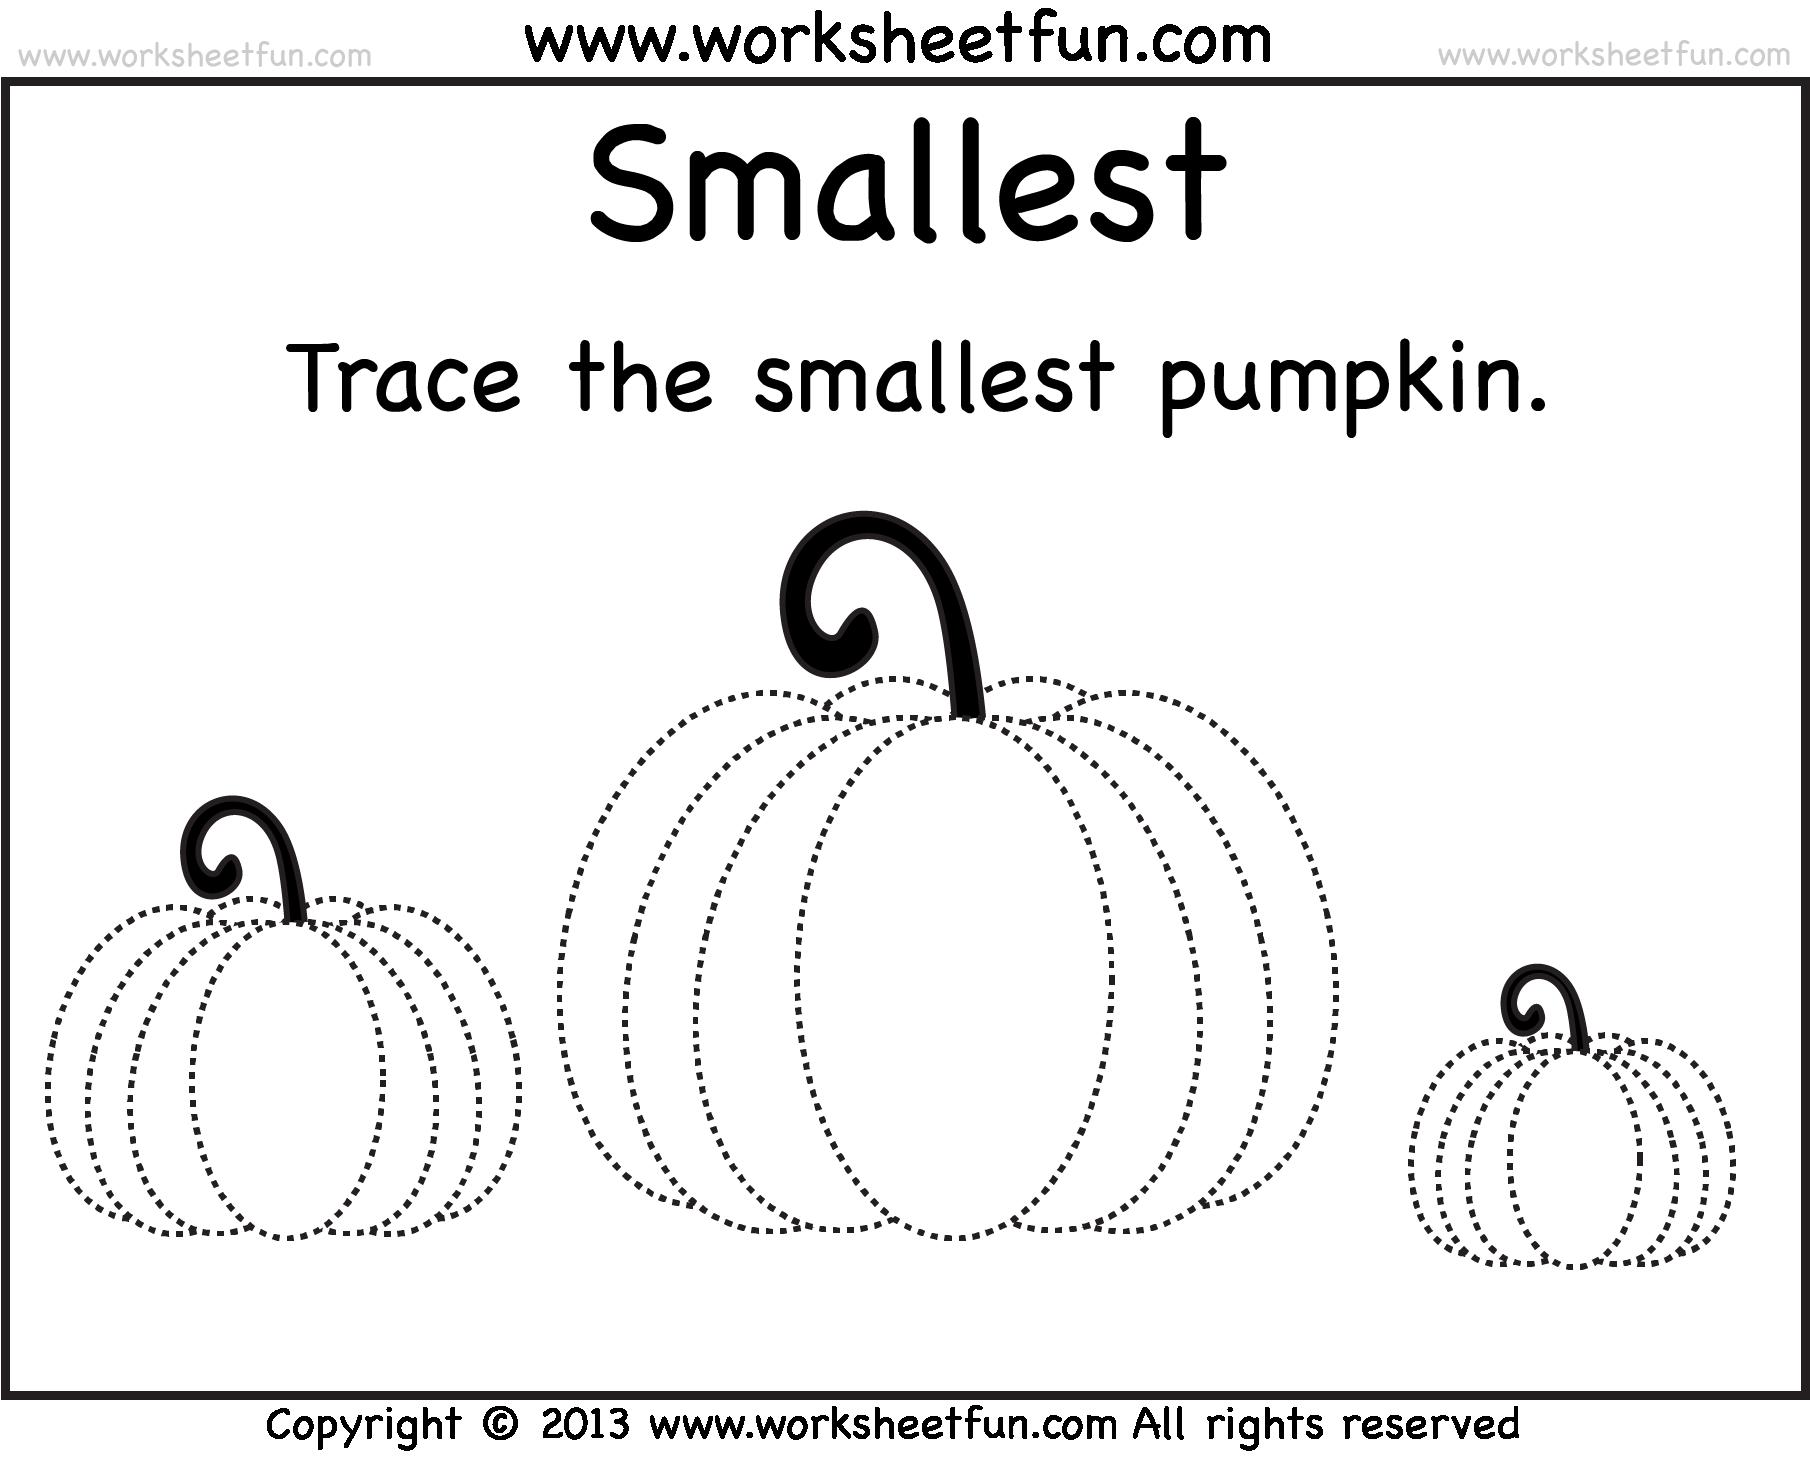 Halloween Pumpkin Smallest Trace Wfun 1